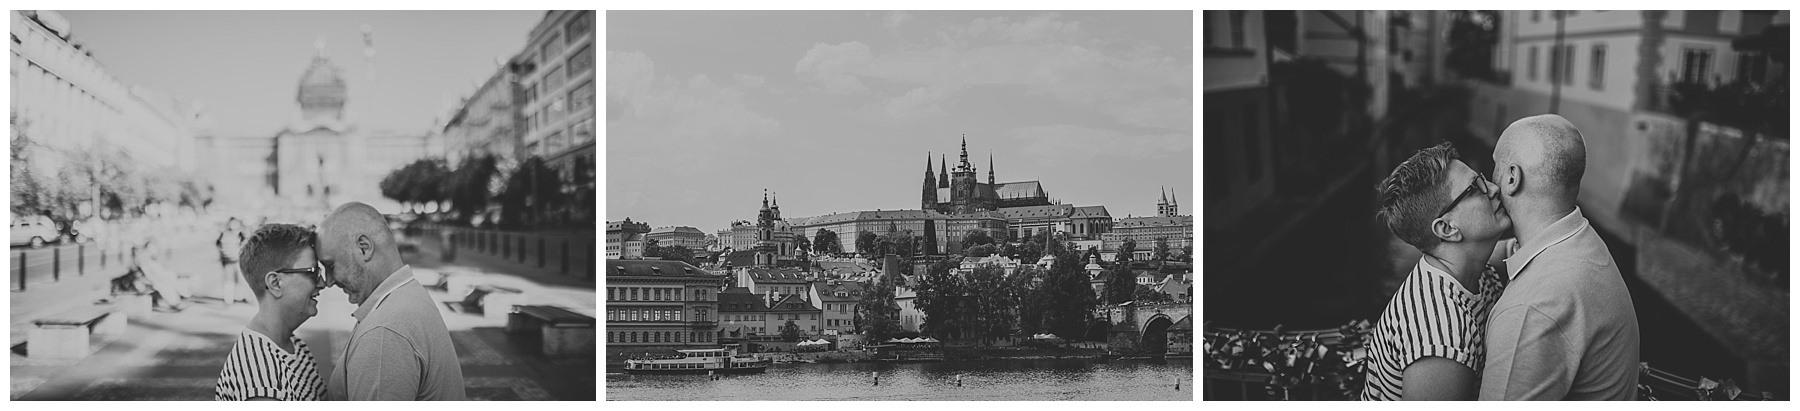 Praga_czechy_fotografia_2017-07-14_0010.jpg